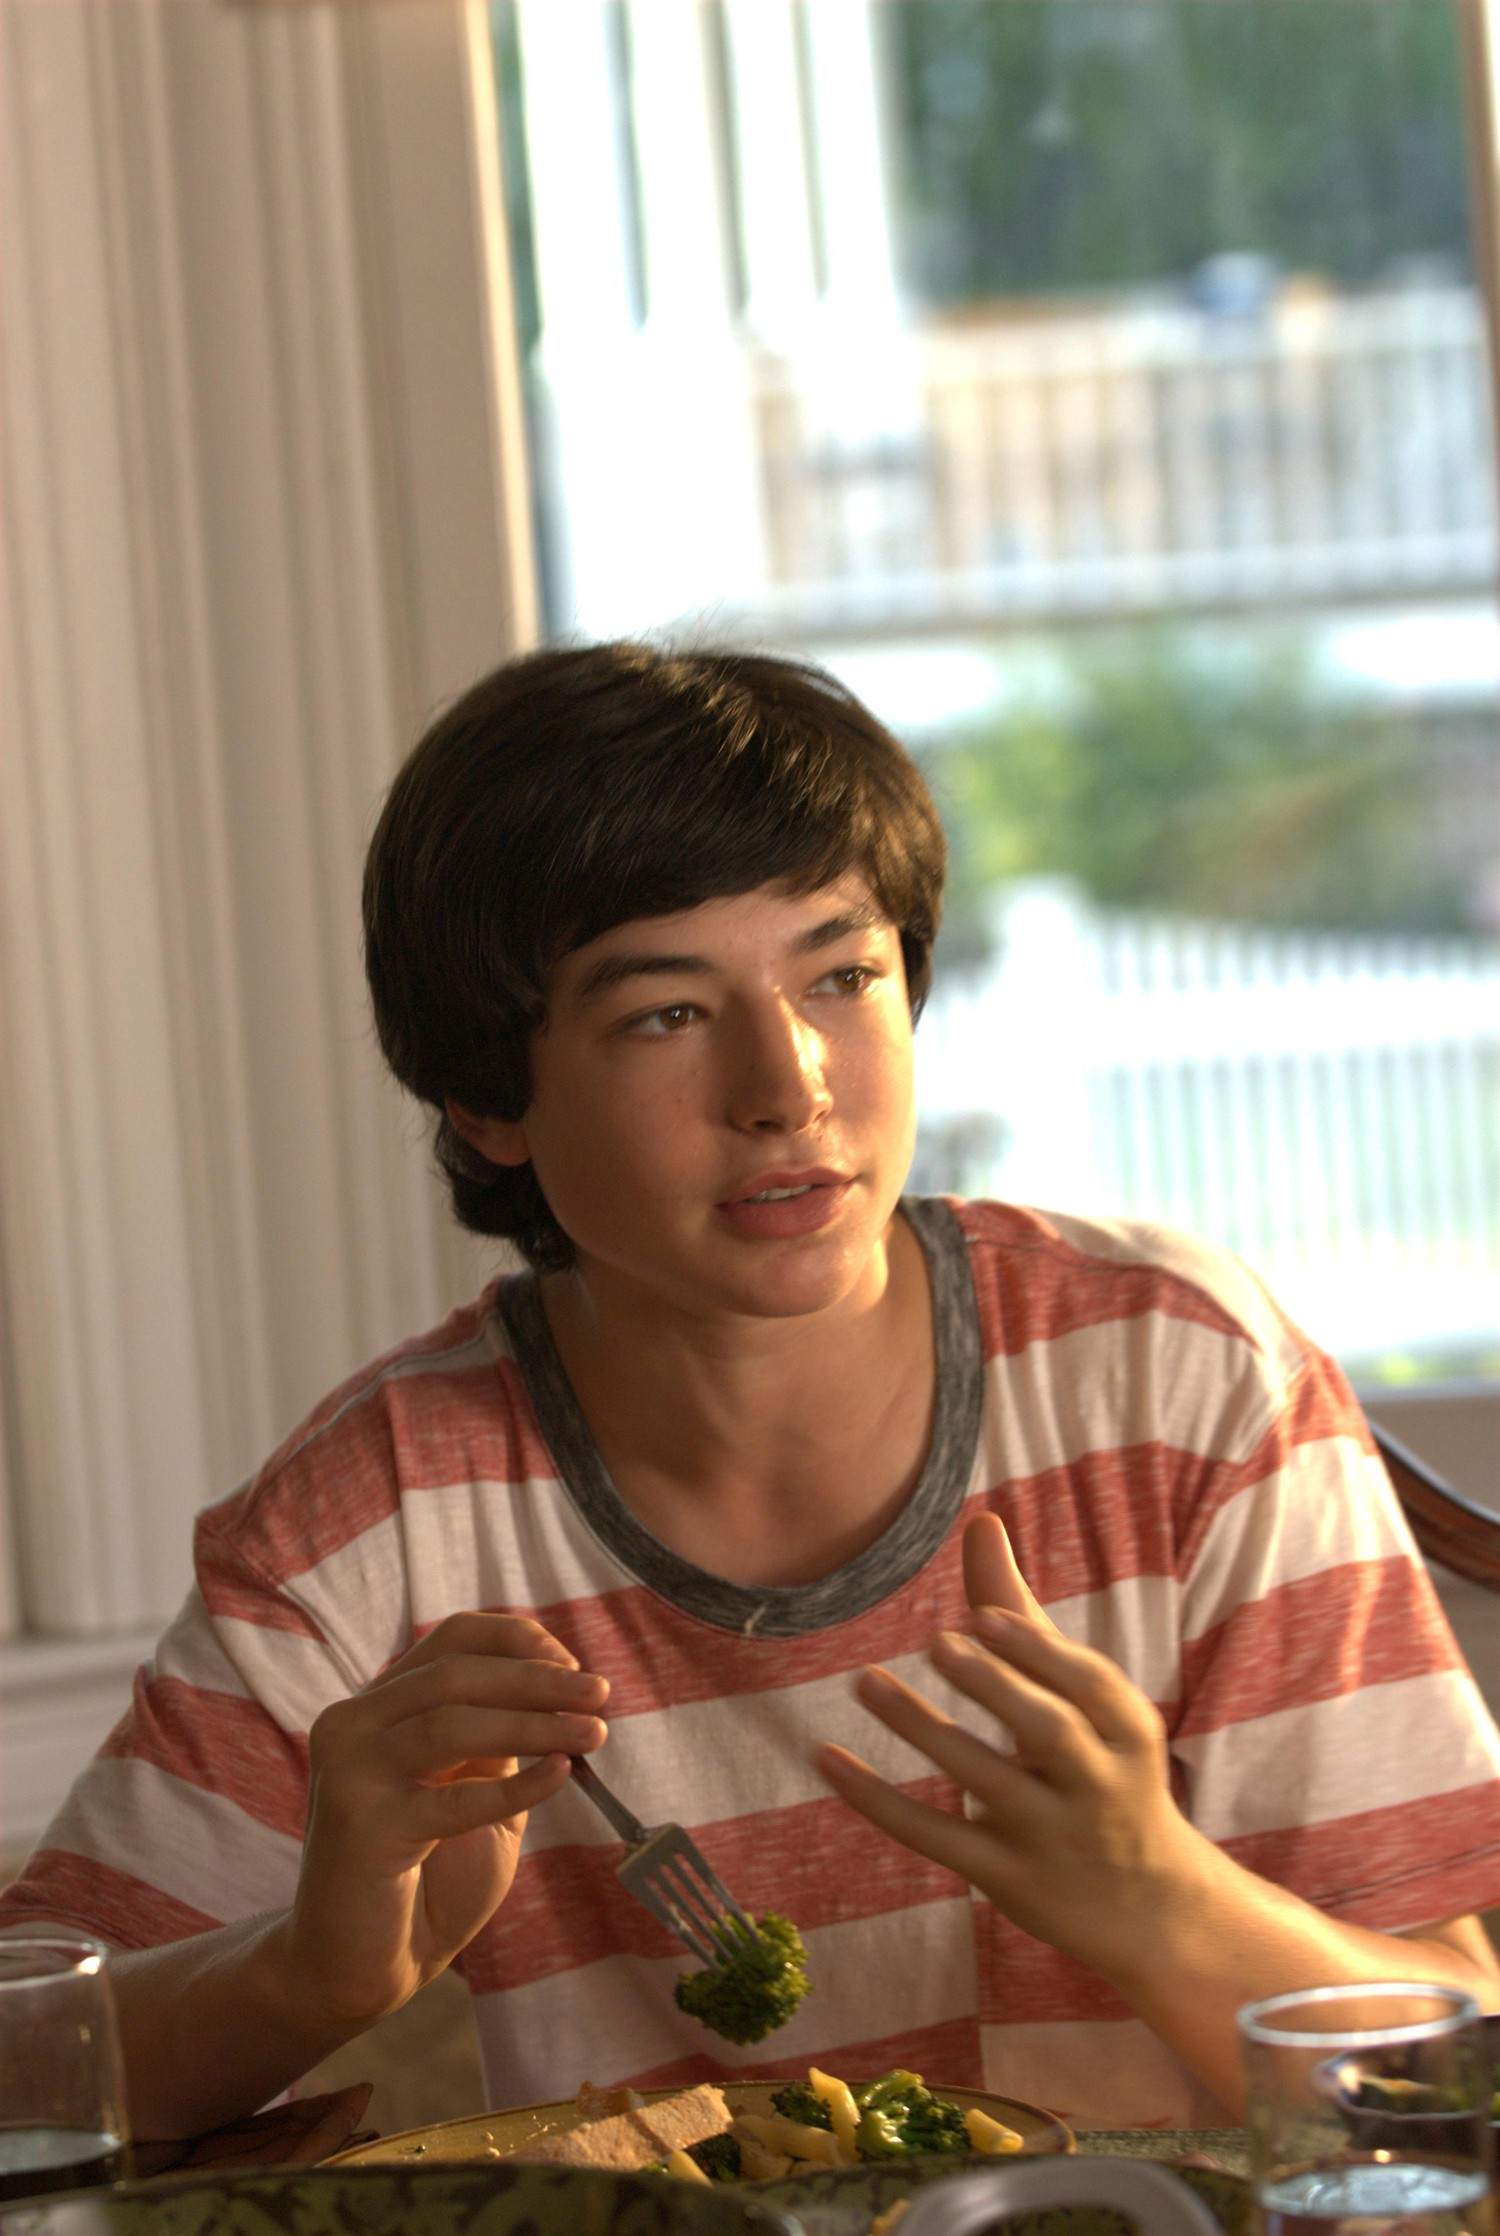 Ezra Miller